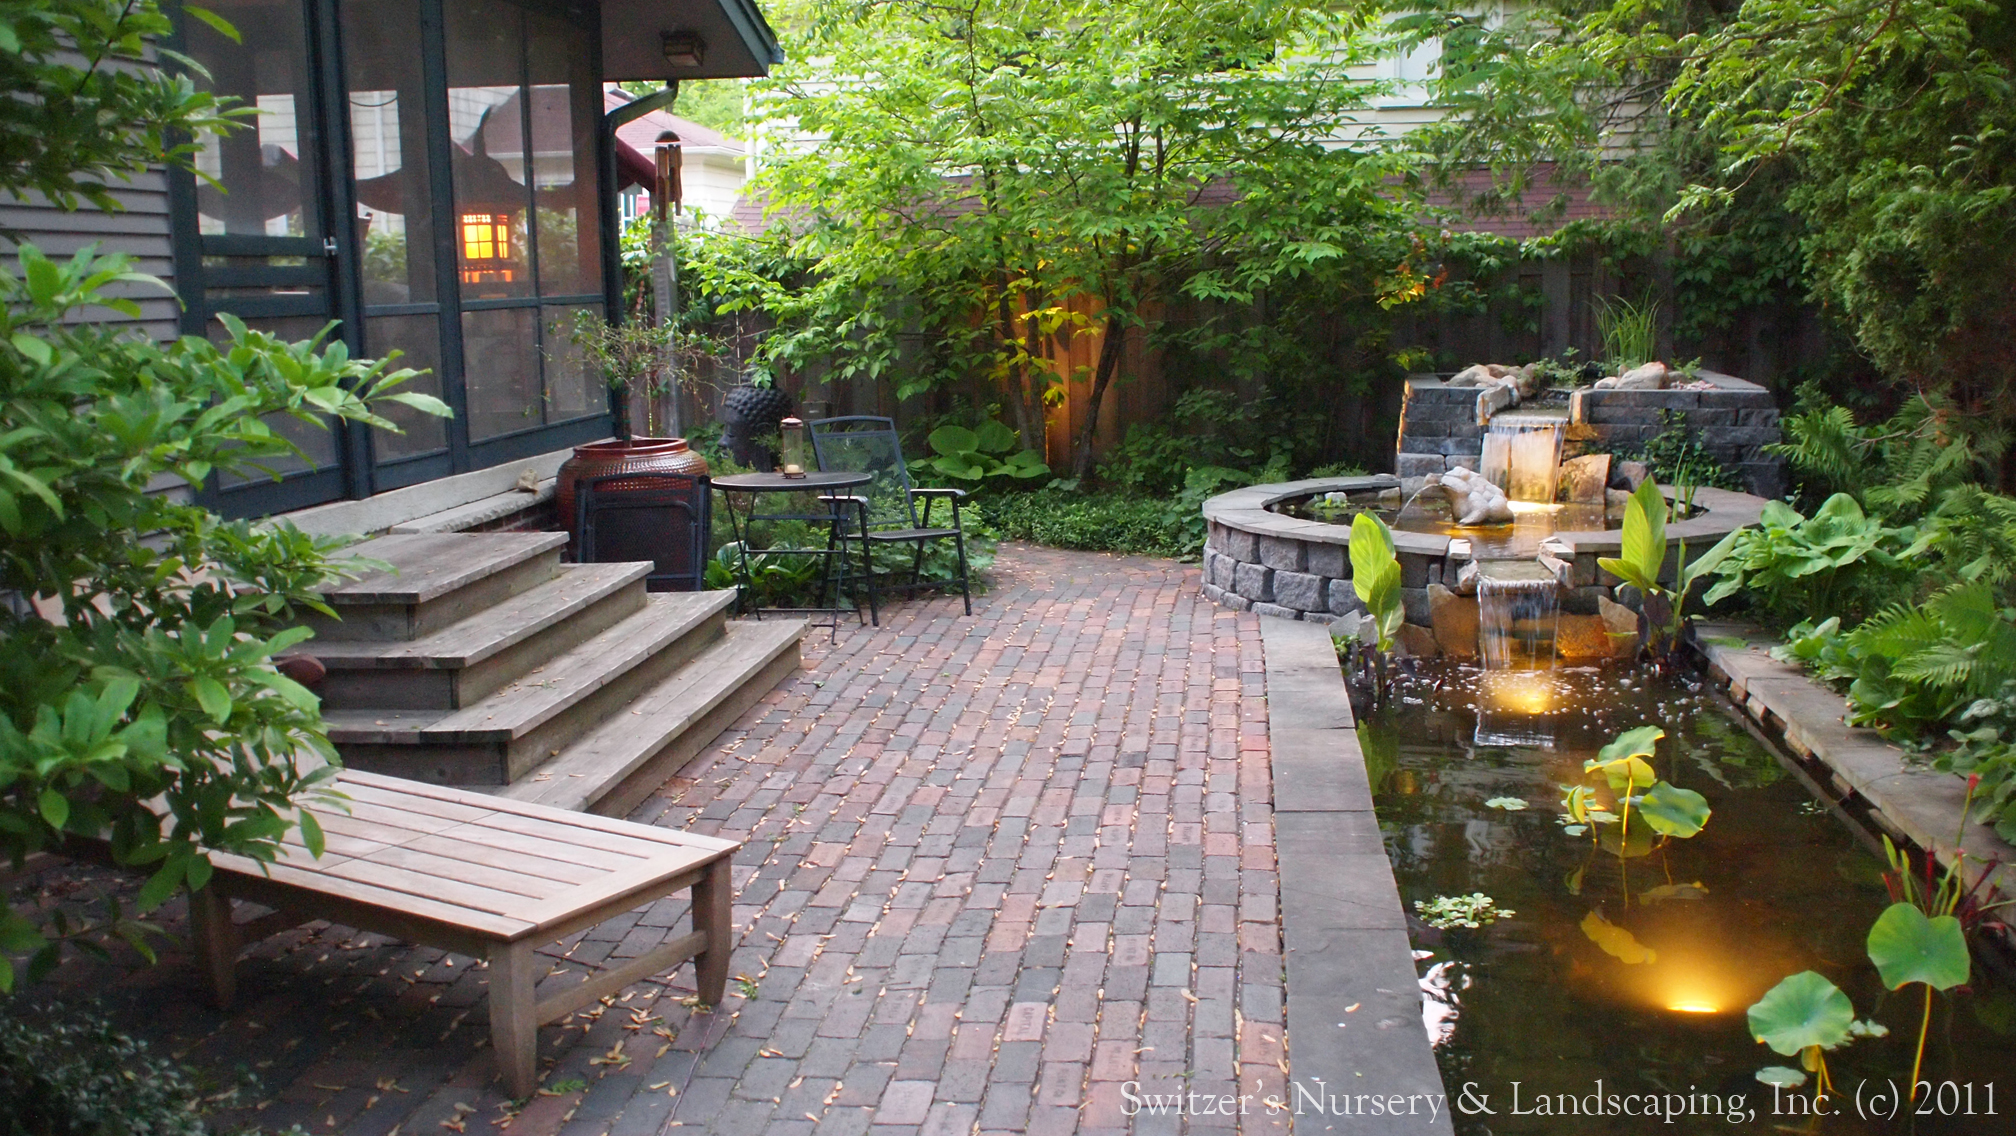 Minnesota landscape design inspired by bali natural for Koi pond garden design